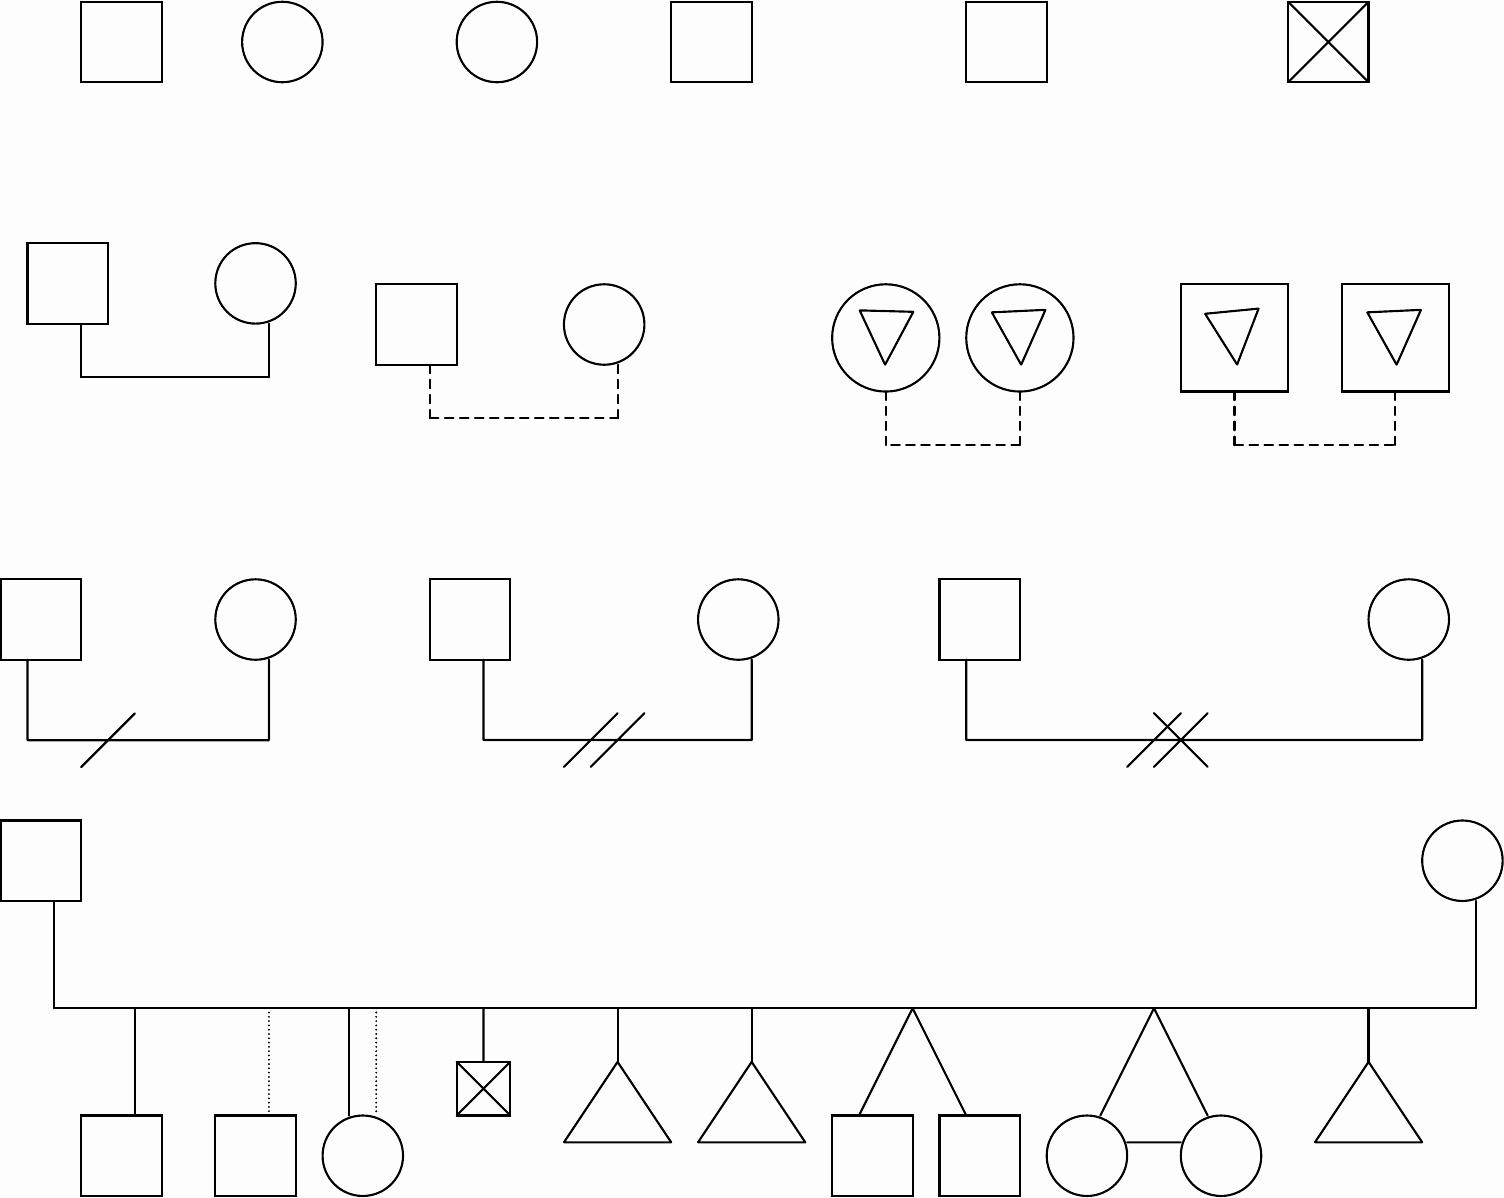 Simple Genogram Example Awesome Basic Genogram Symbols Template Edit Fill Sign Line